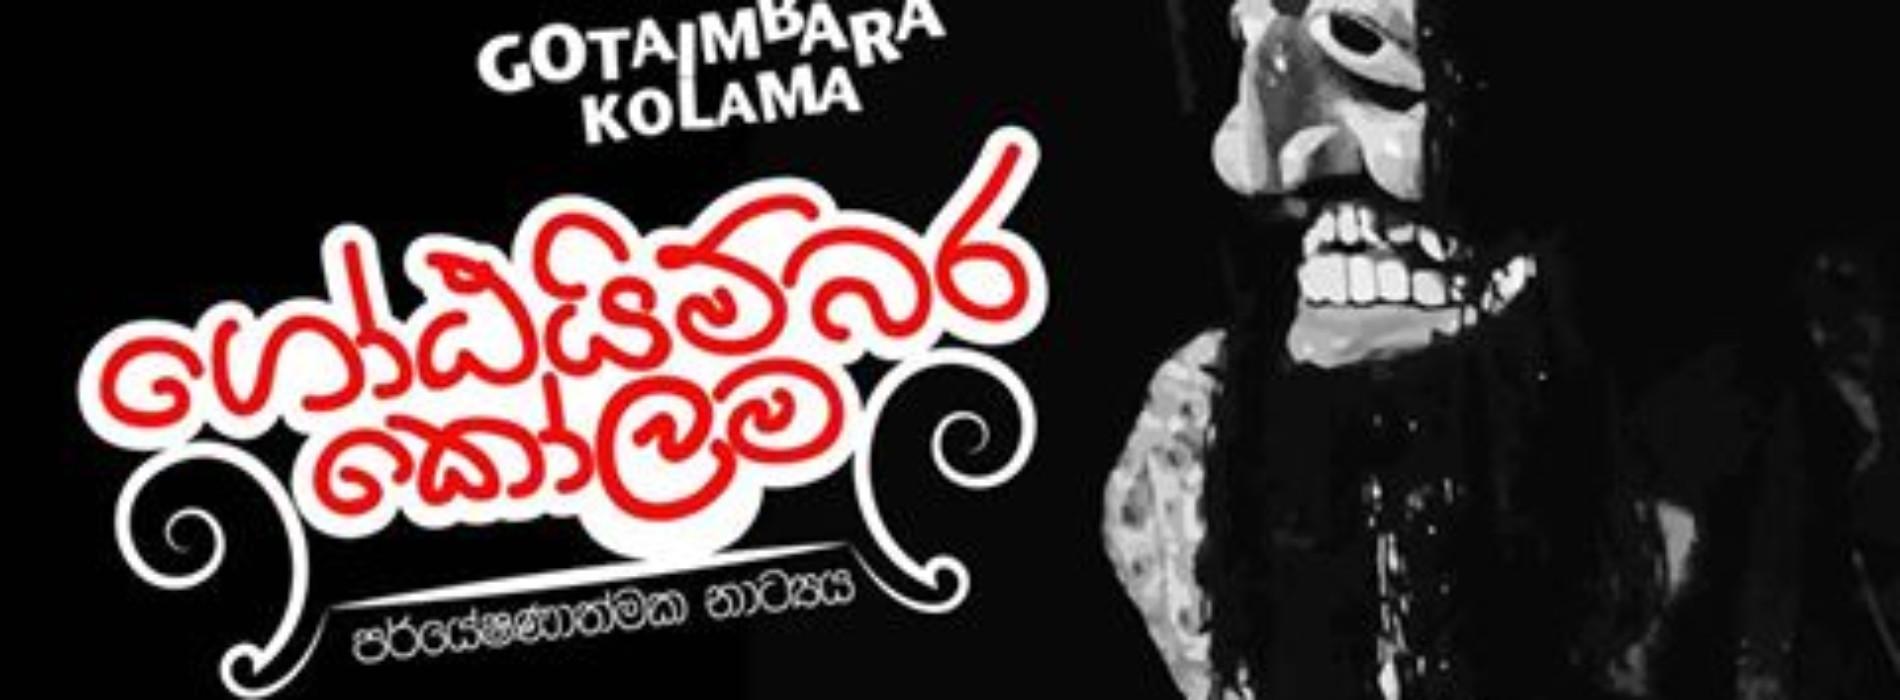 Gotaimbara Kolama : The 2016 Finale